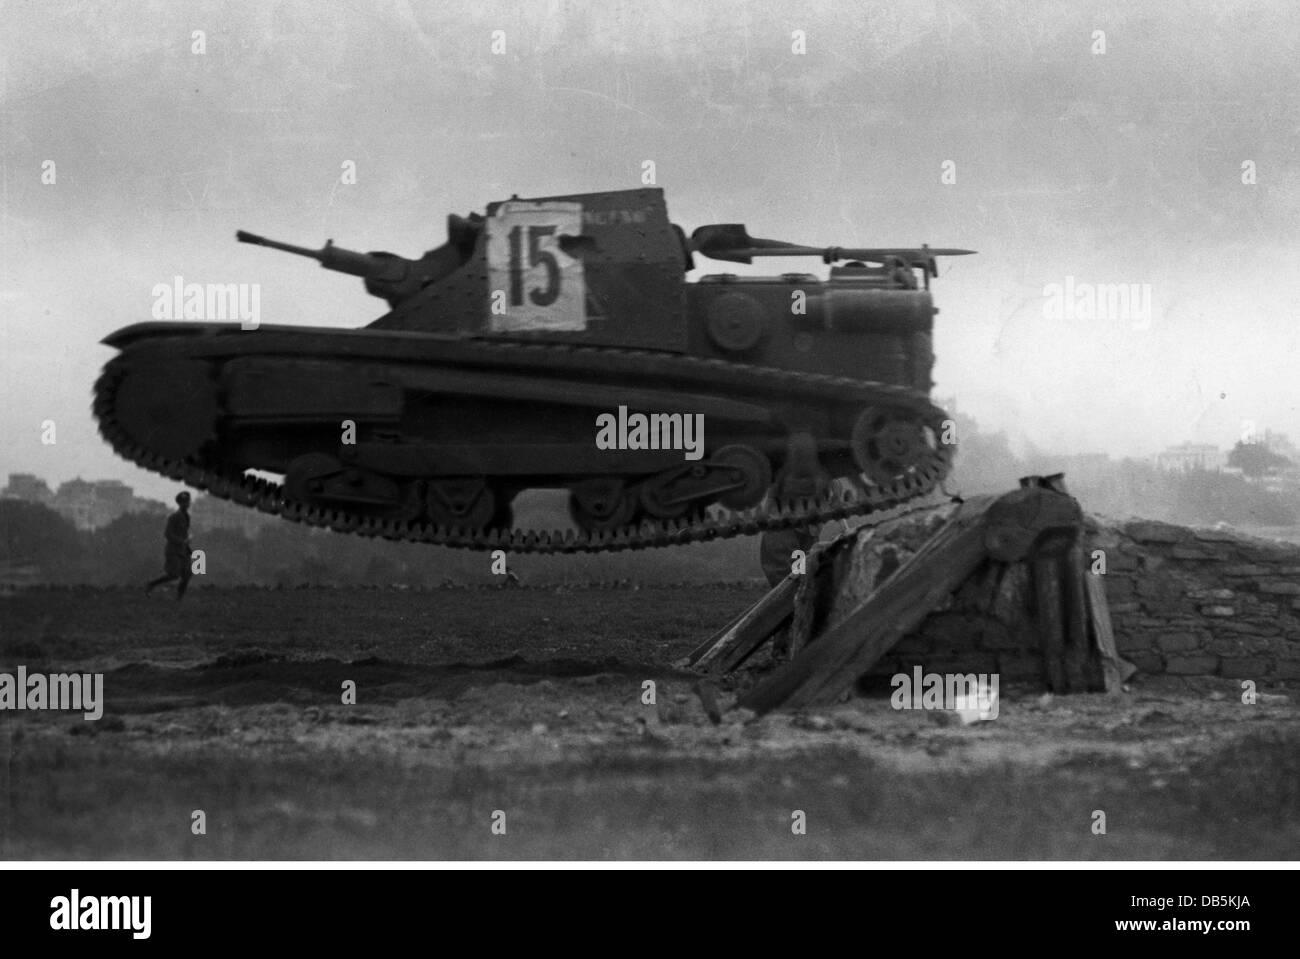 a tankette carro veloce cv 35 l3 35 stock photos  u0026 a tankette carro veloce cv 35 l3 35 stock